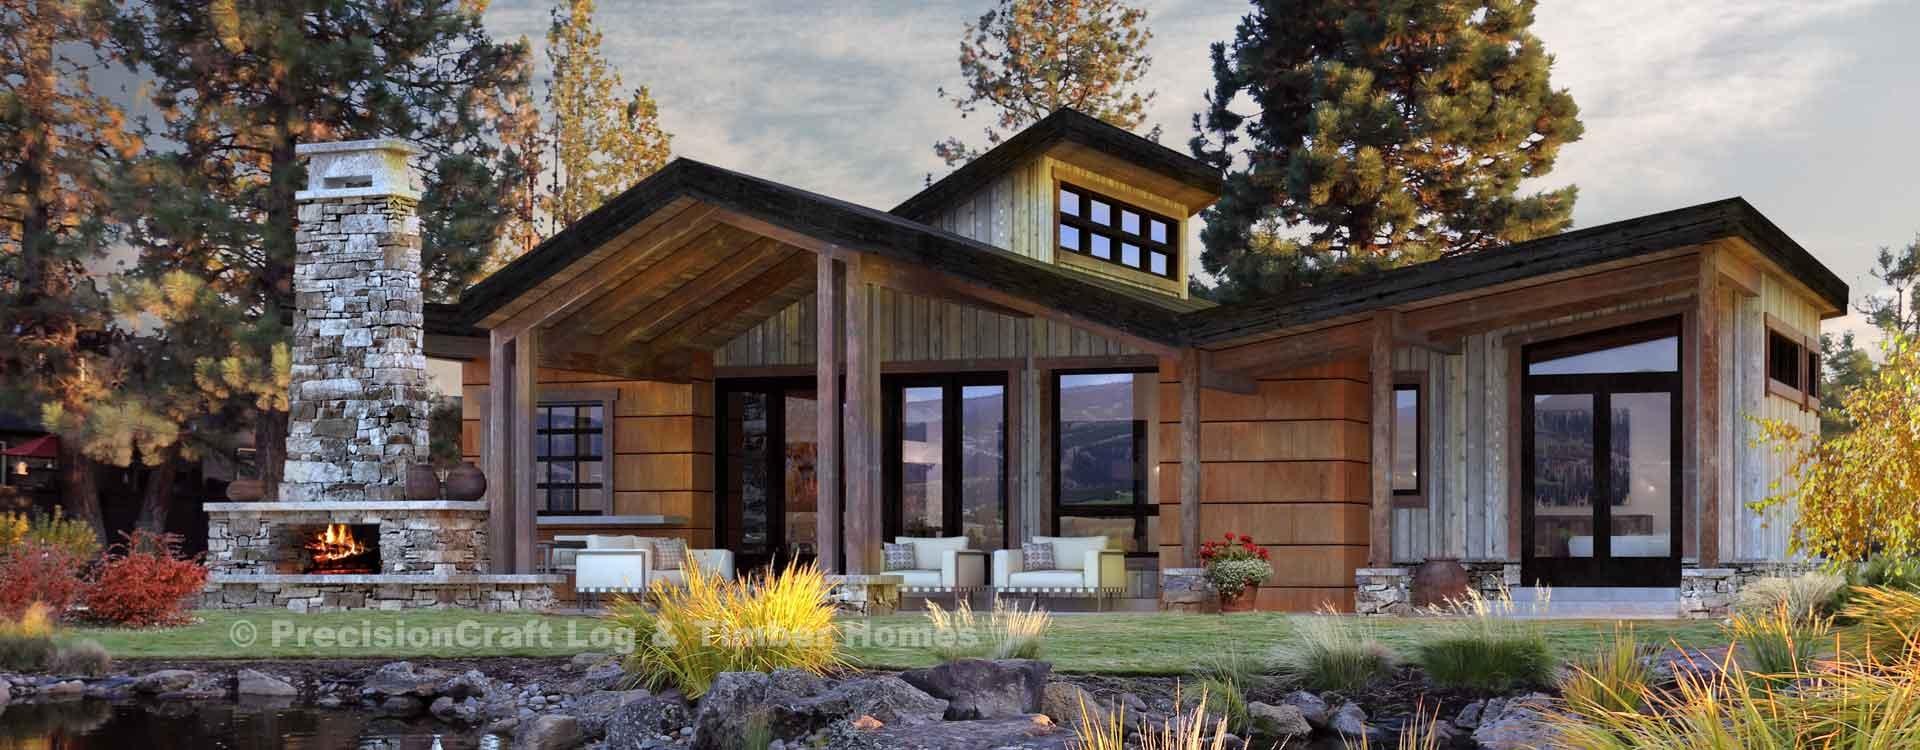 coldwaterHeader Single Floor Plans Log Home on log cabin homes floor plans, simple one story floor plans, single floor cabins, single story house plans, single level log homes,